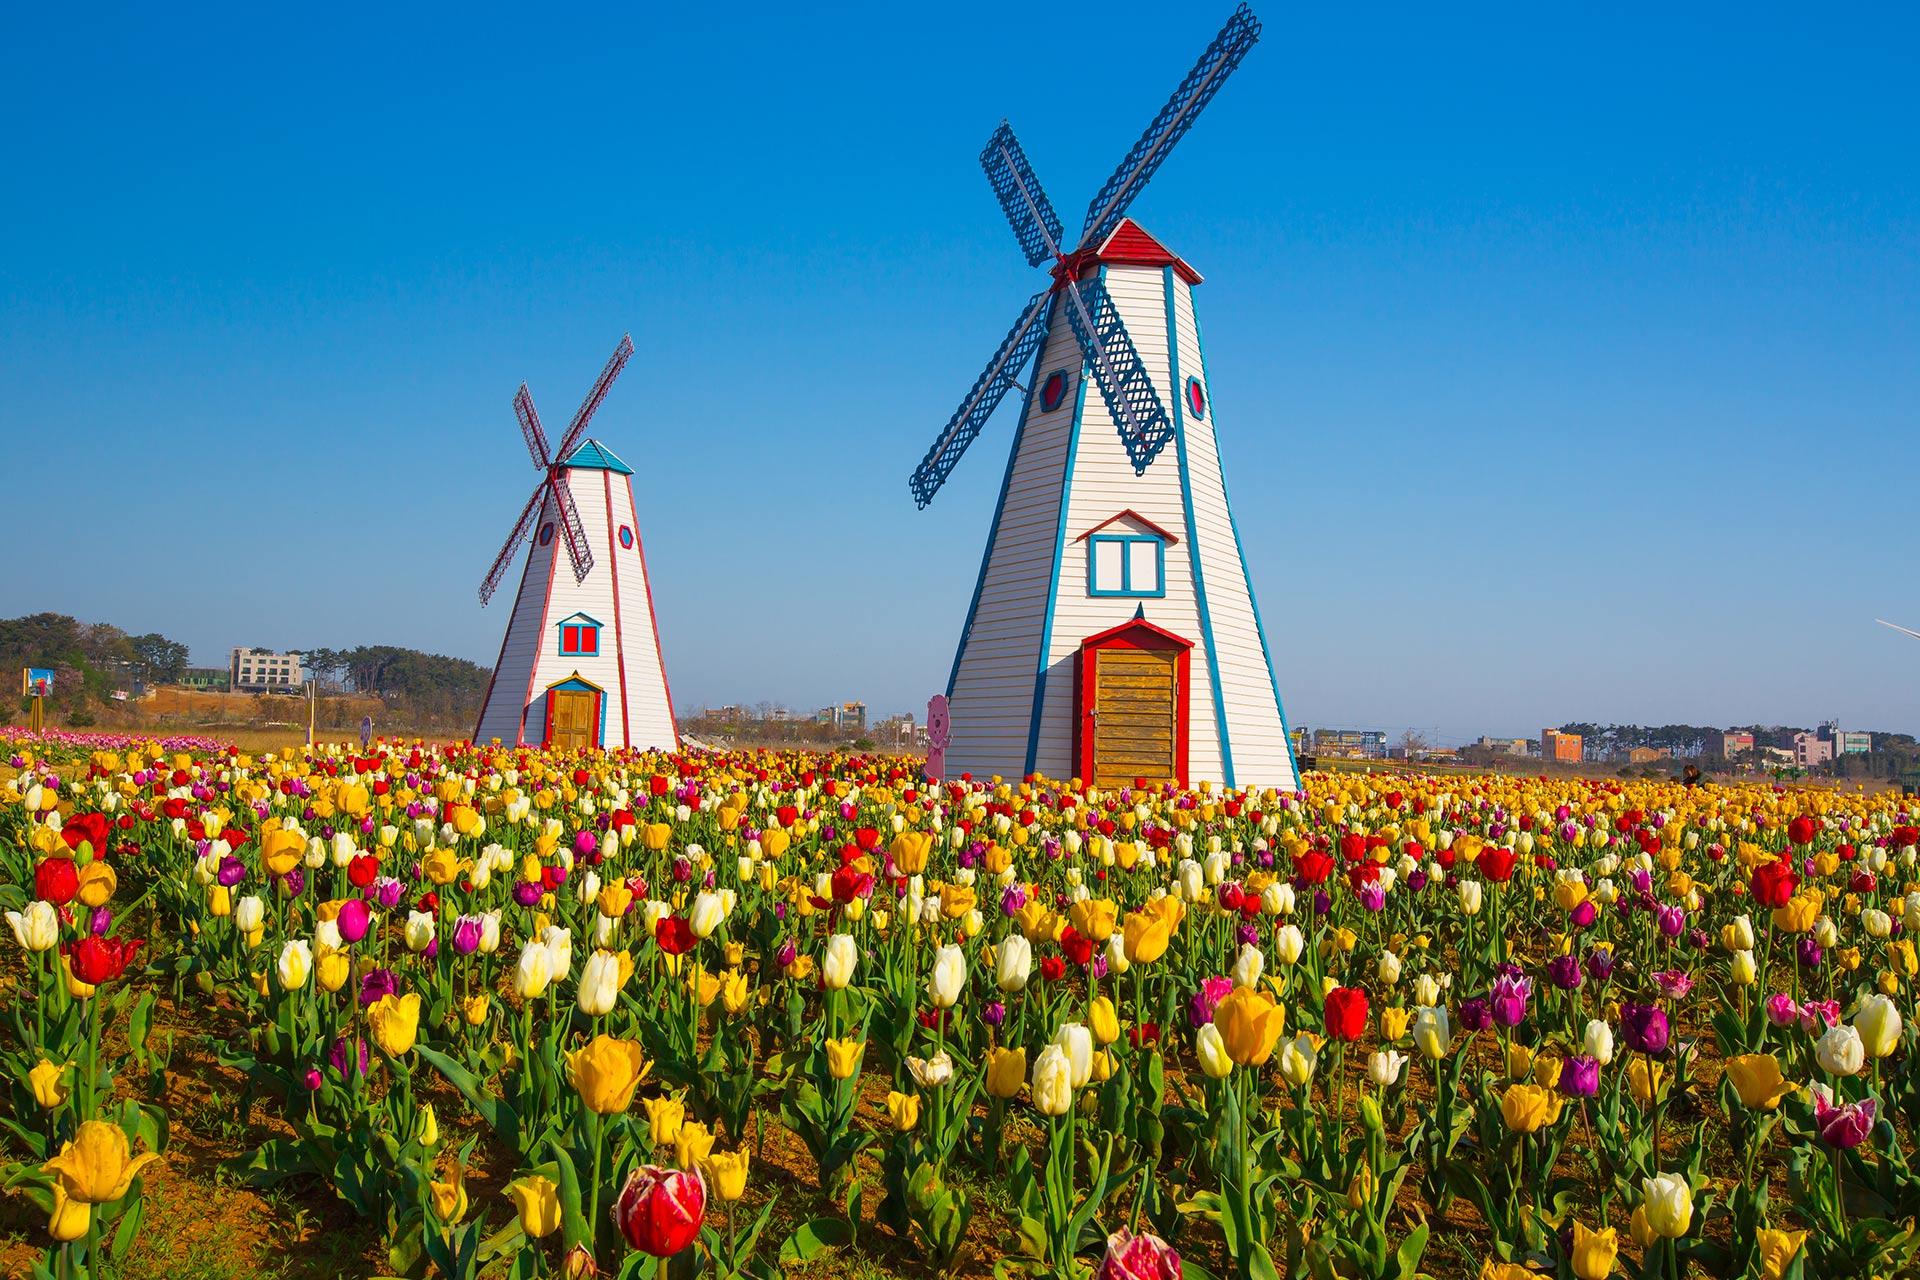 Holland, Michigan.